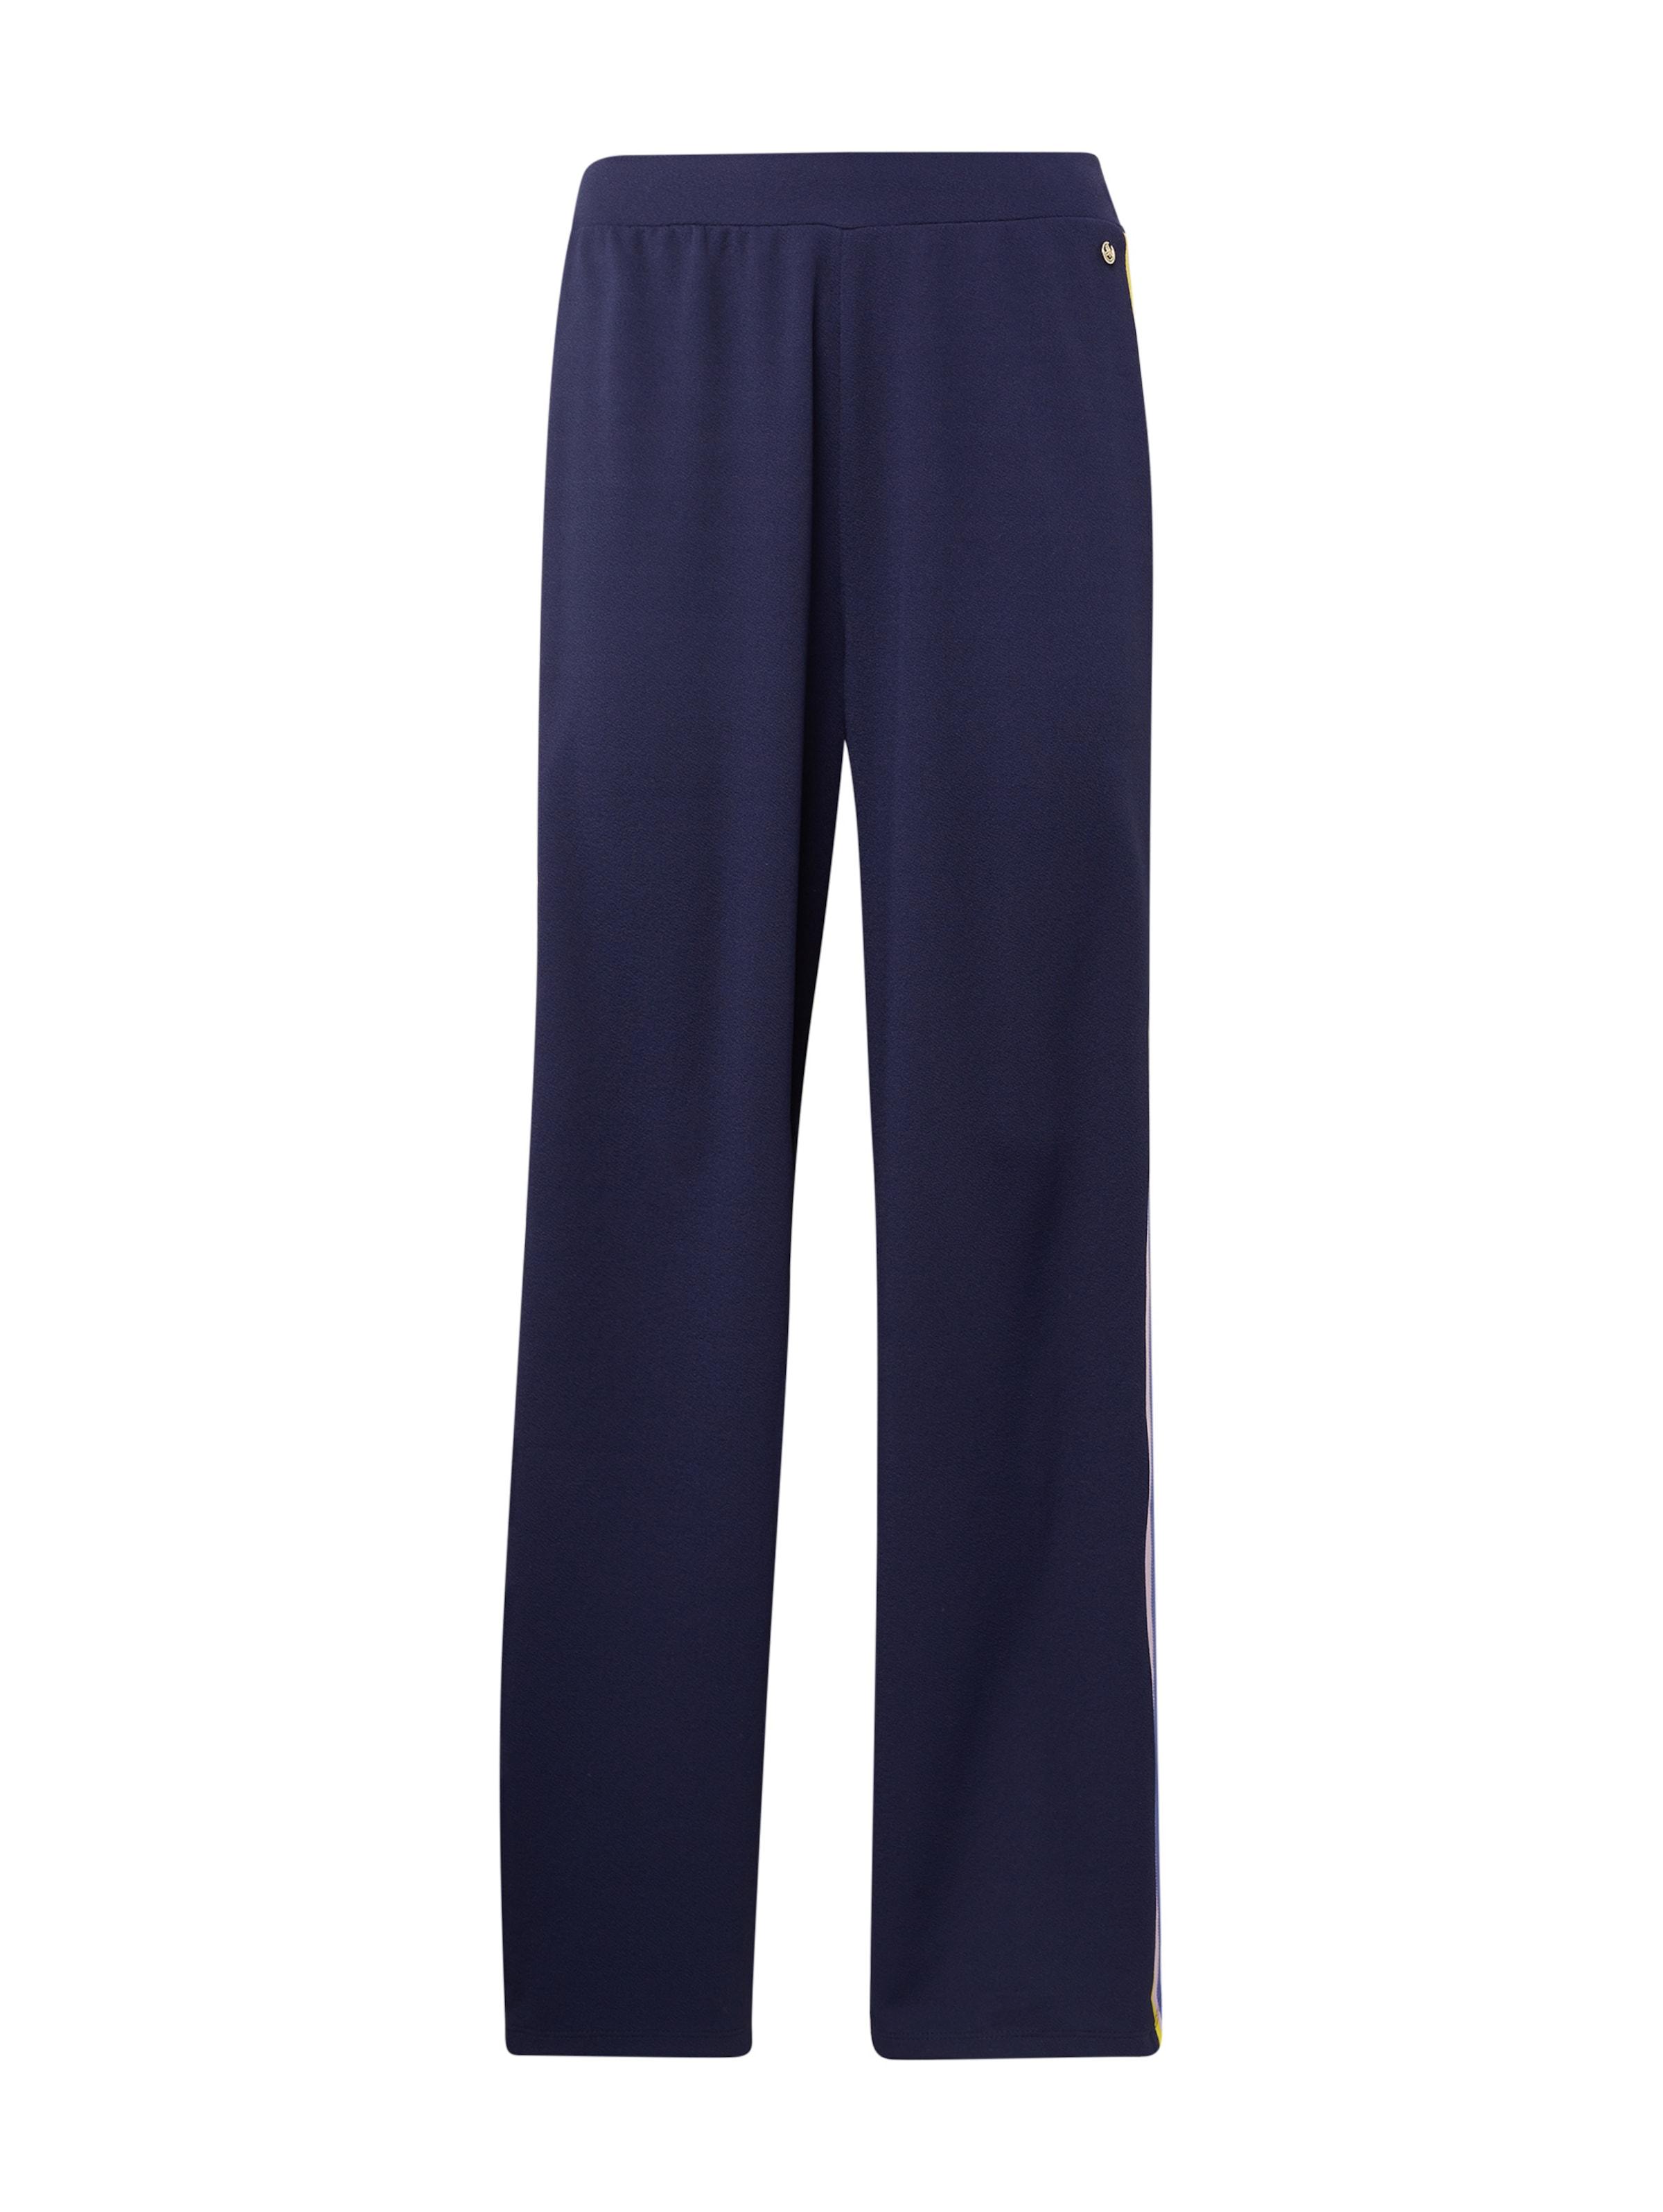 FoncéJaune Tom Bleu Tailor Denim En Clair Vert Pantalon P0OkX8nw